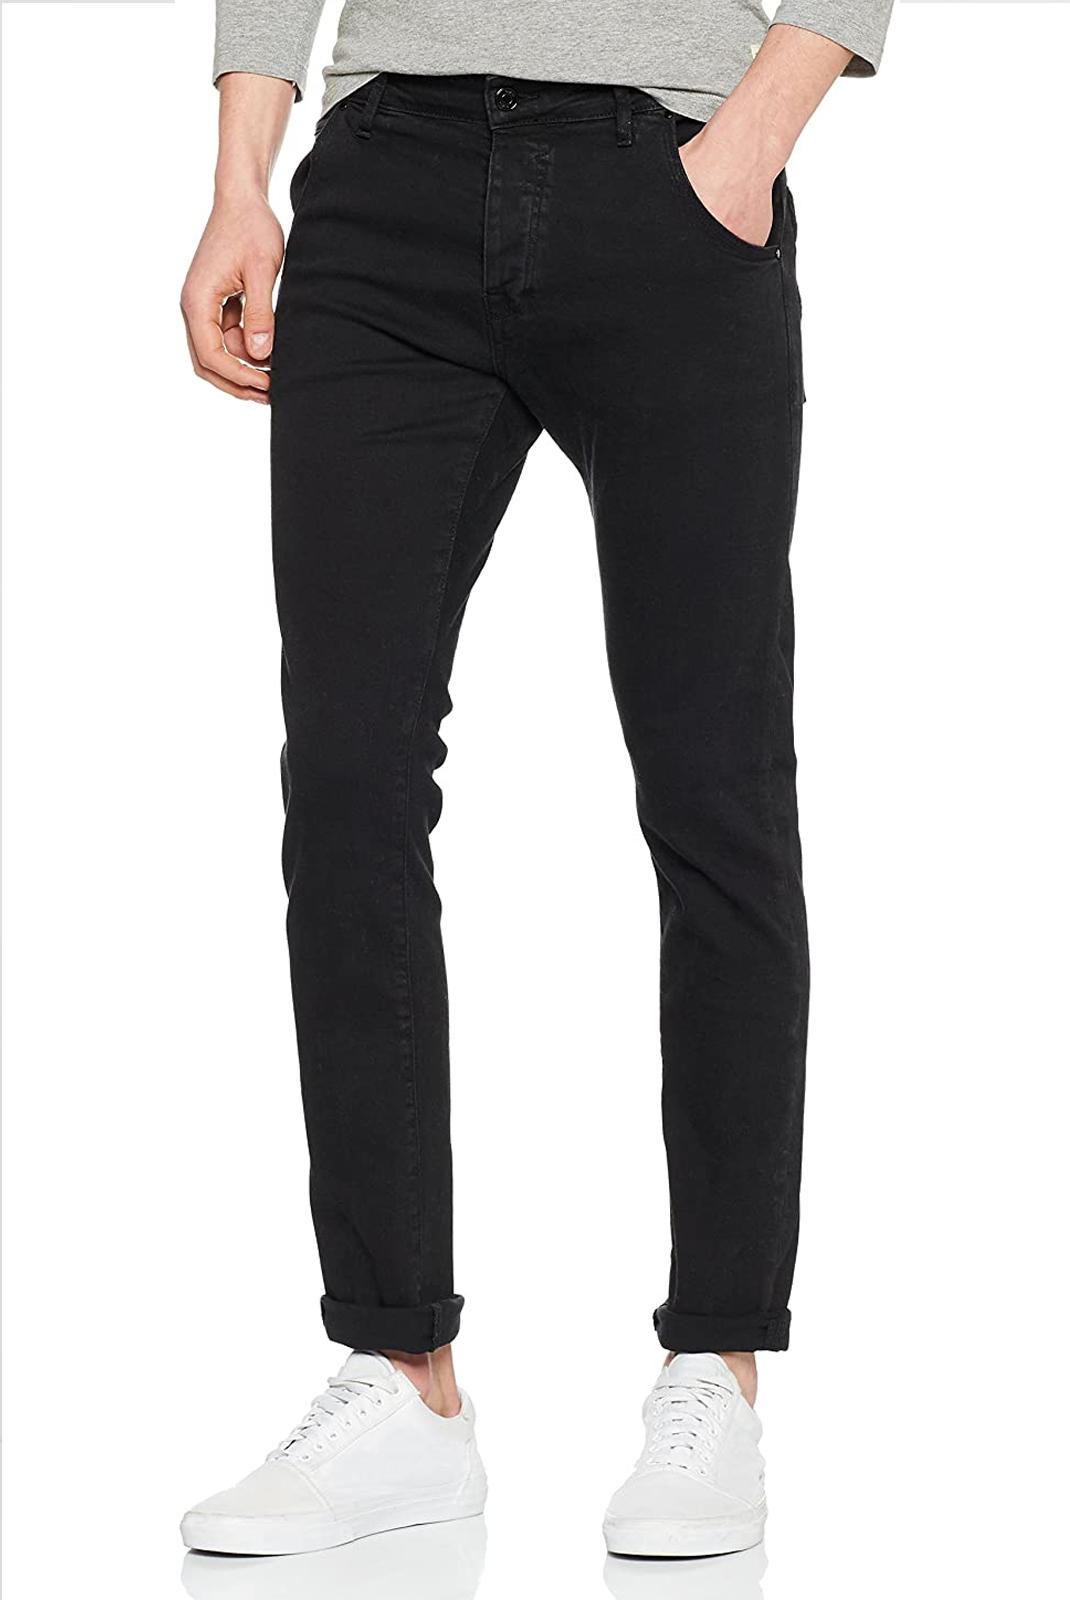 régular  Guess jeans M81A05D2YM0 cliff SILVER.